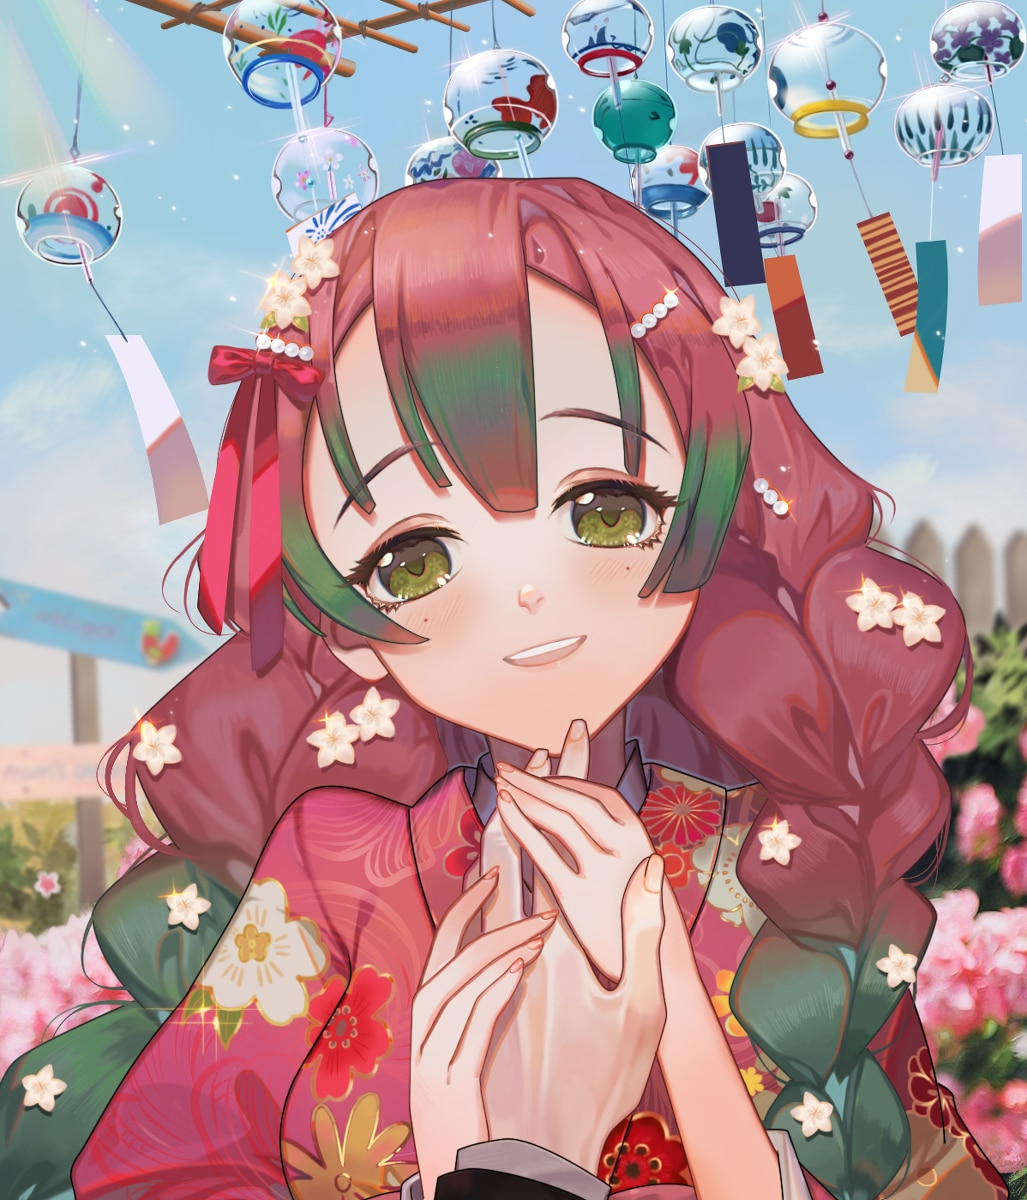 Kimetsu no Yaiba Album Artwork Collection - Artist Peach Luo (猫又汐沁)